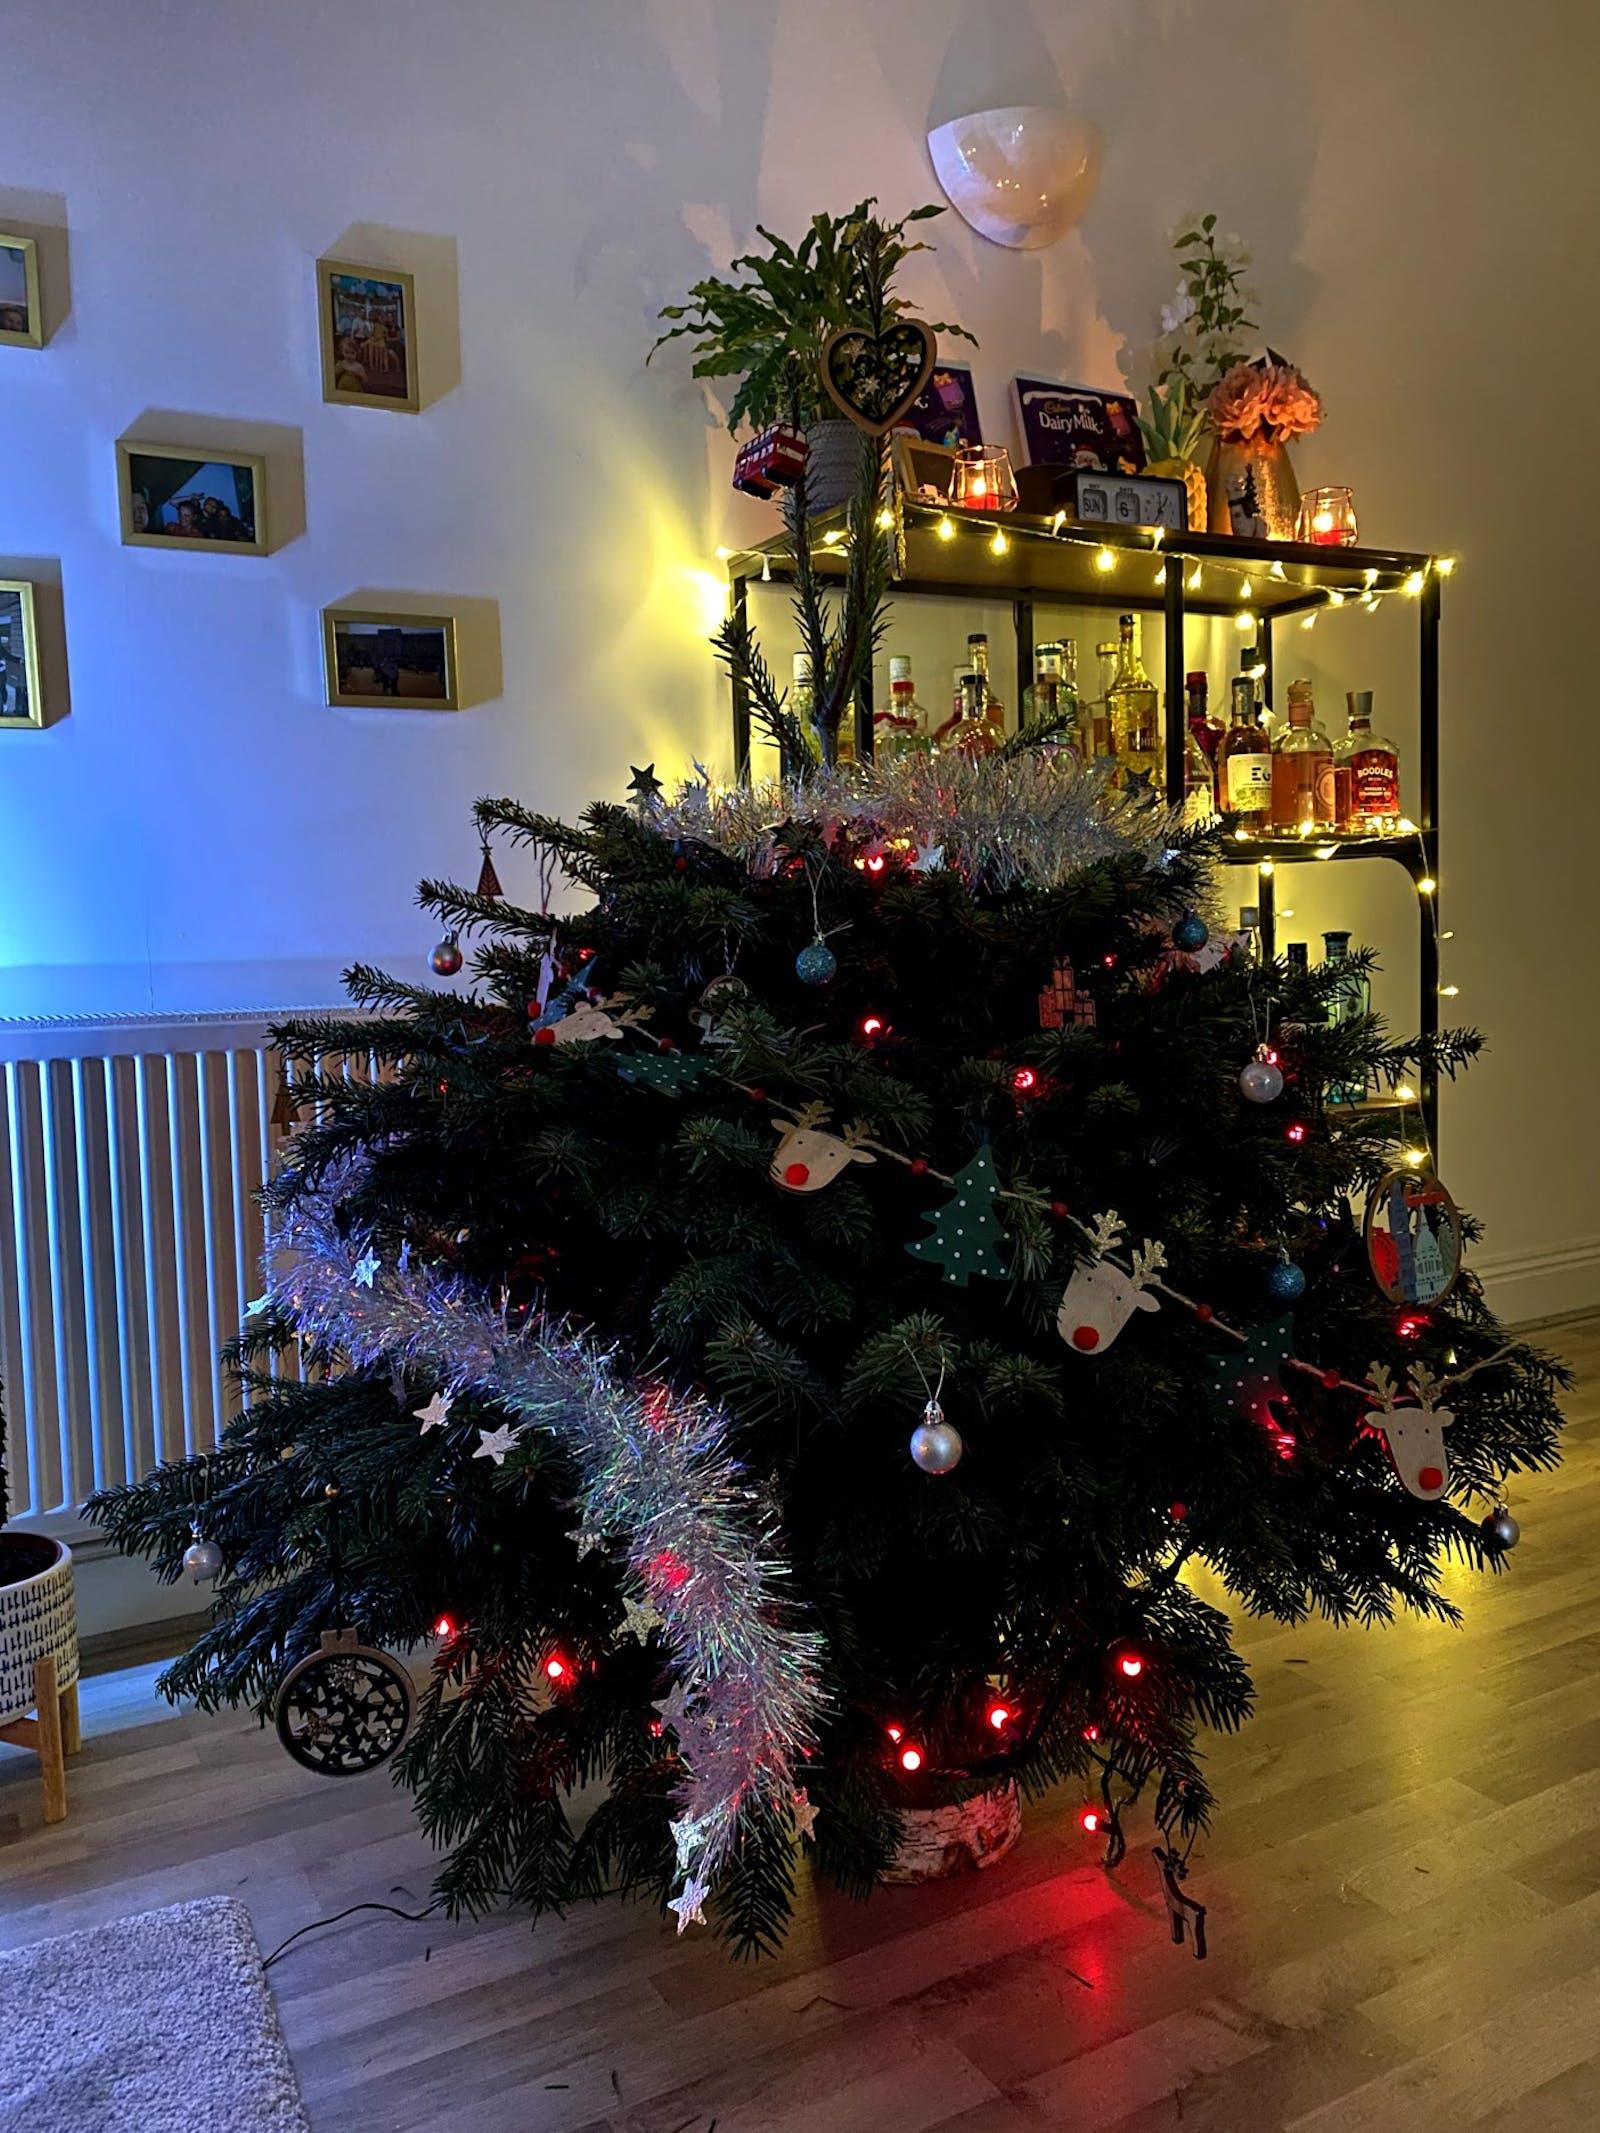 Christmas tree with reindeer garland